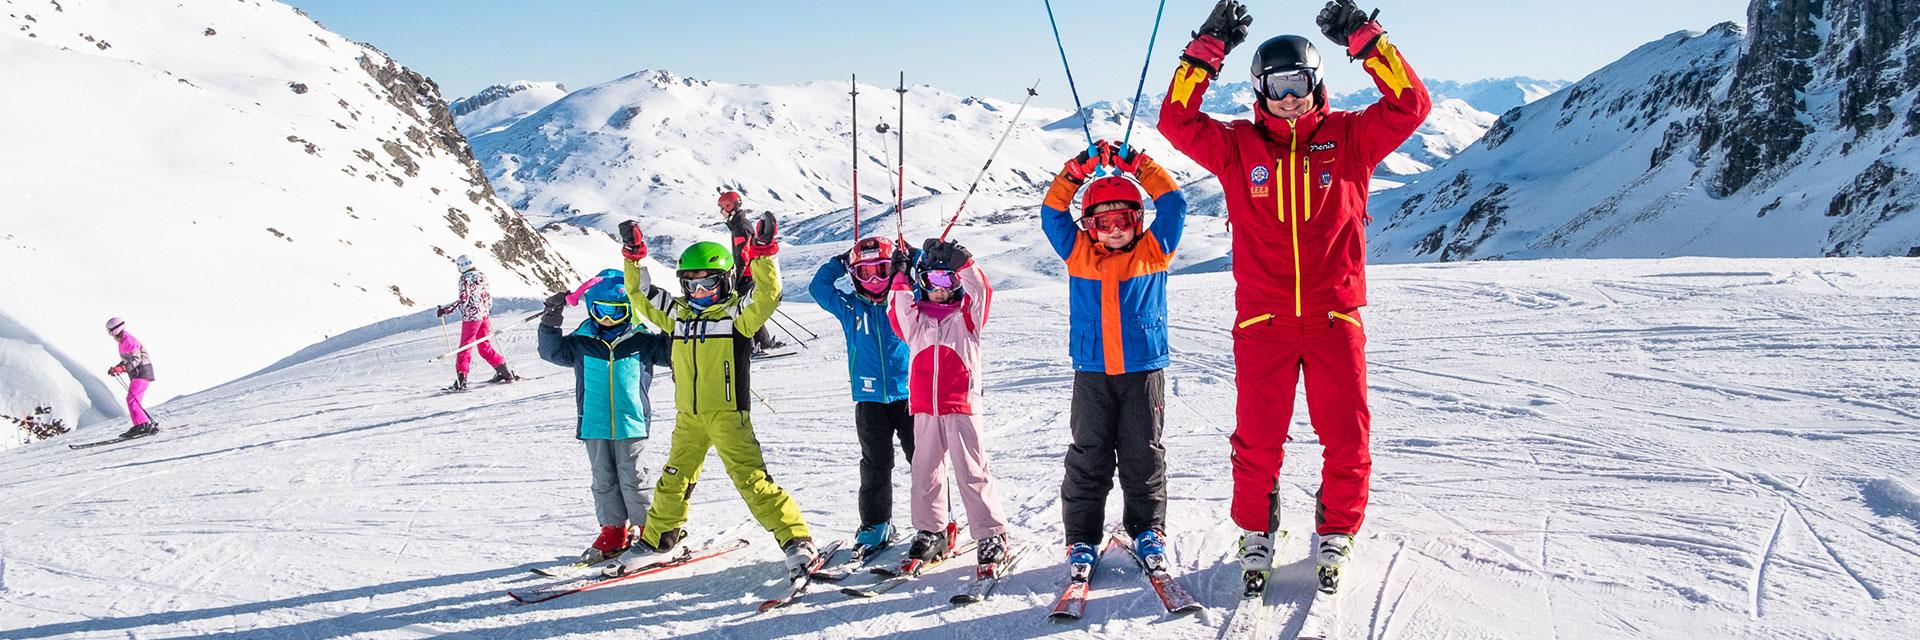 SnowboardEscuelaSanIsidroPortNoticias